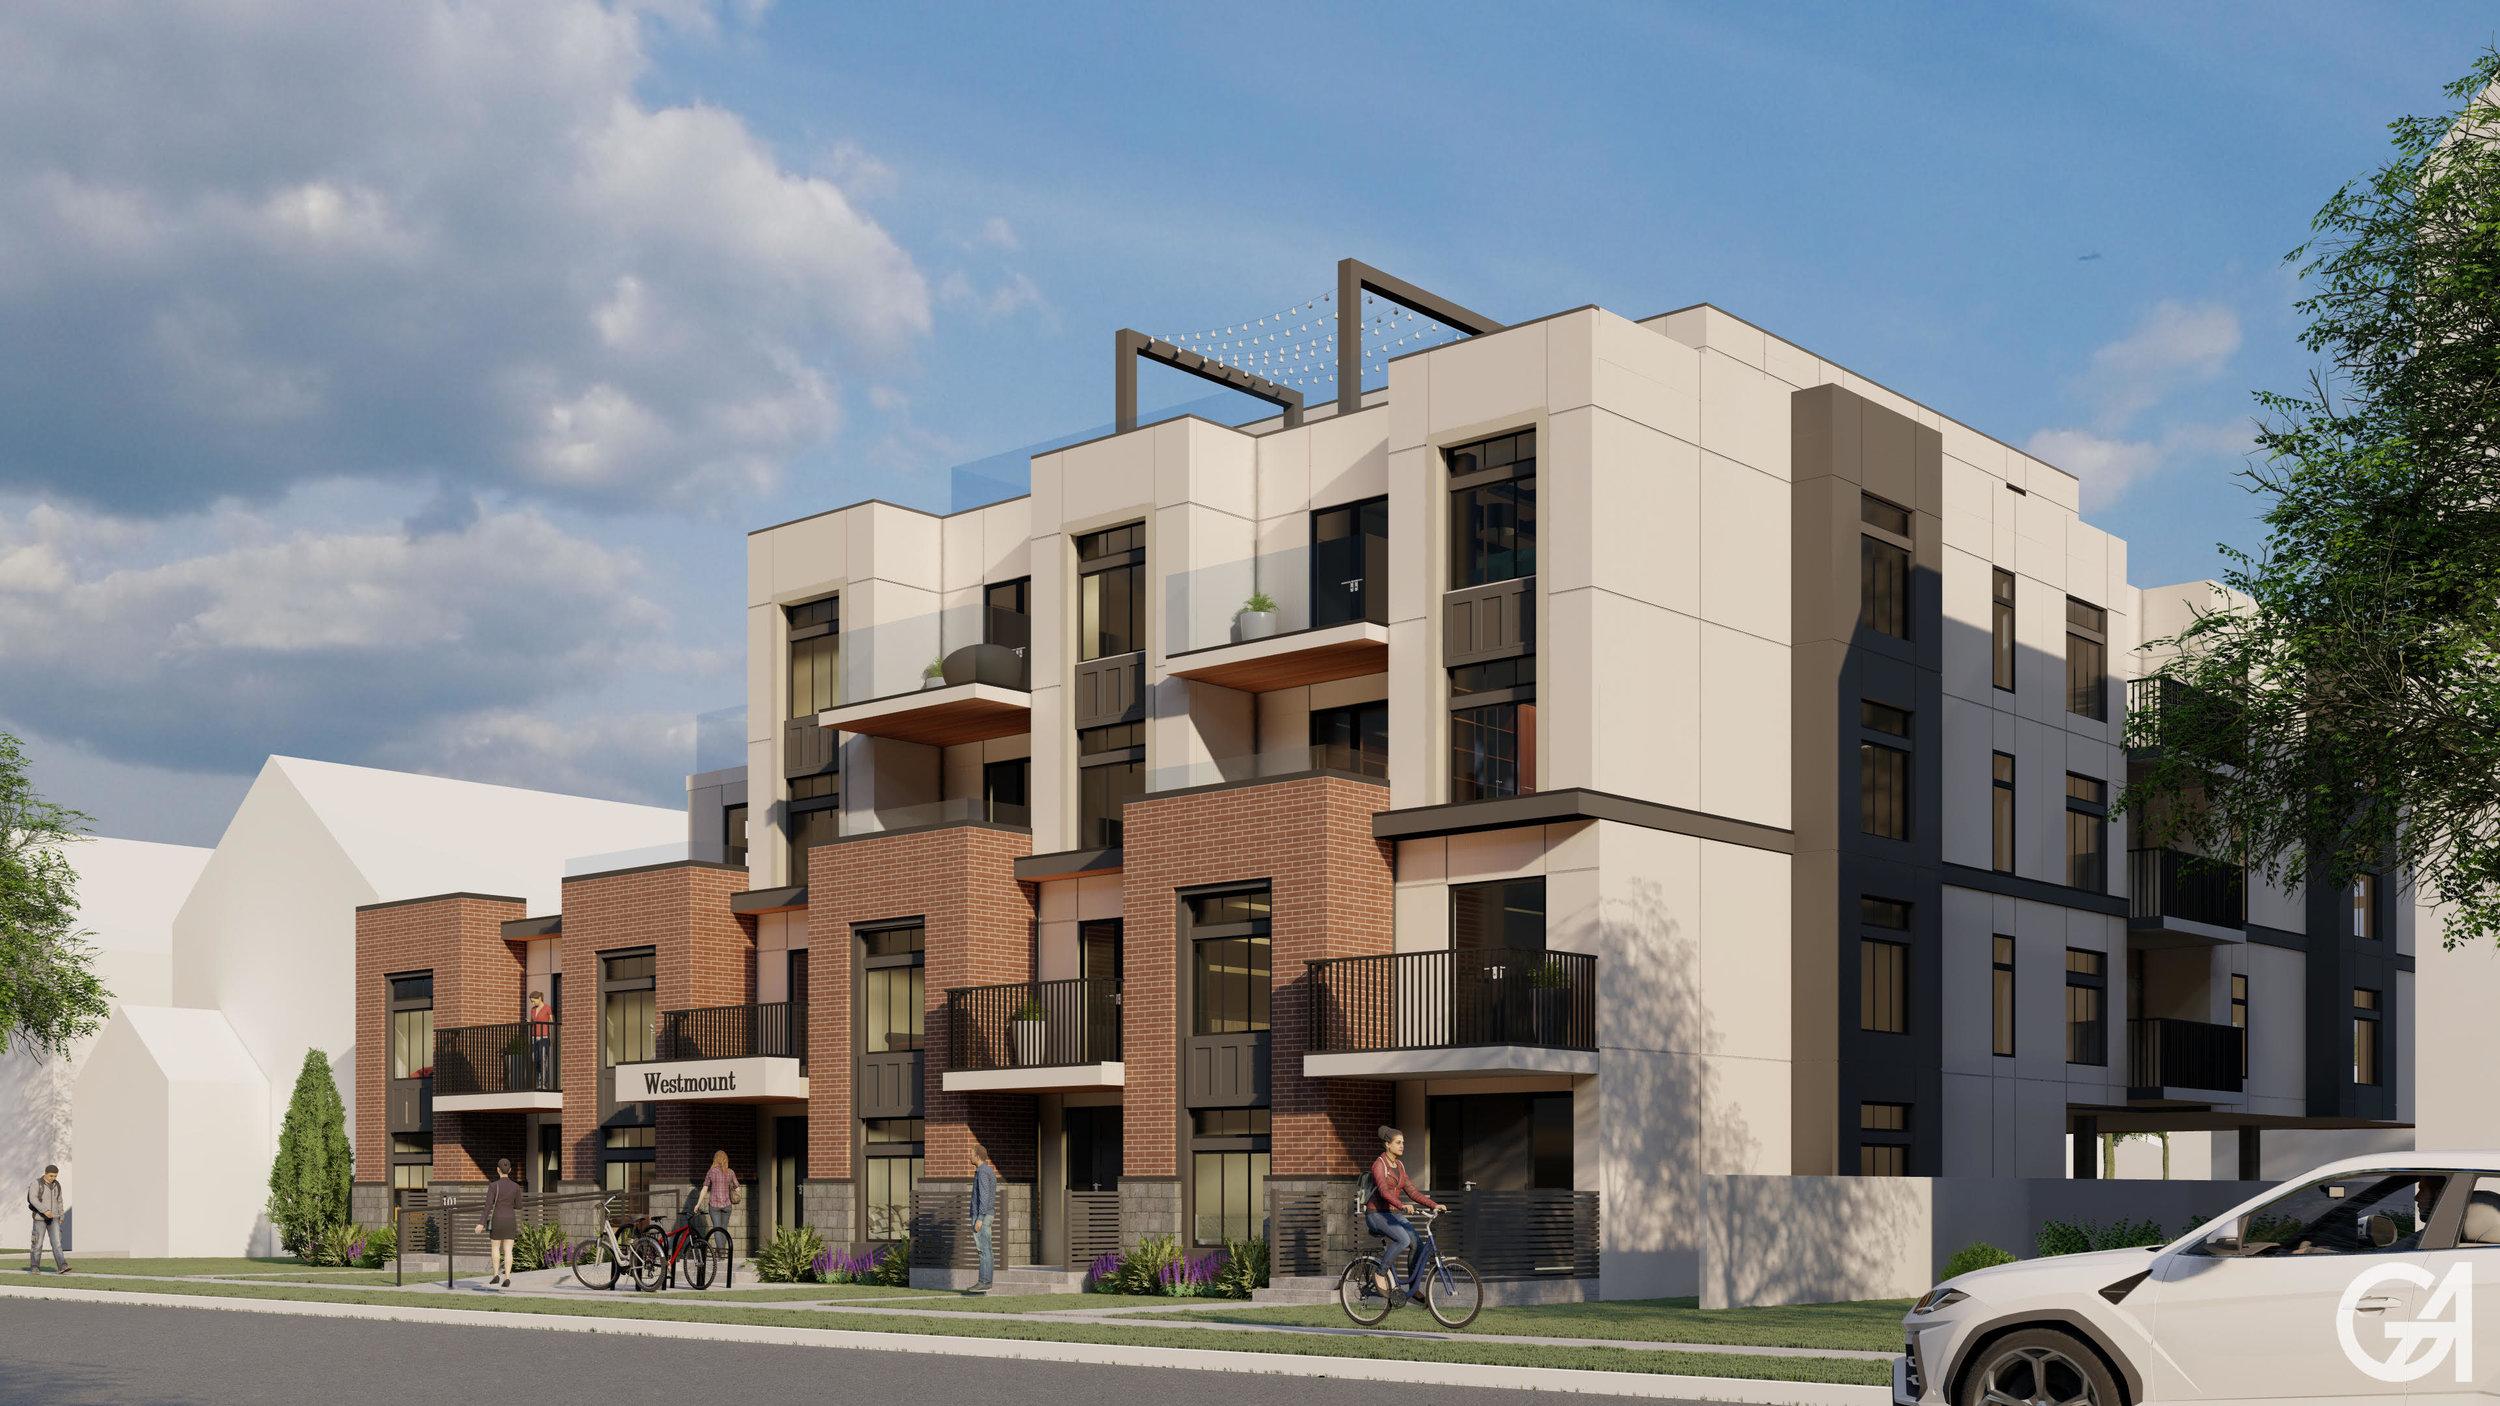 westmount-122-apartments-1.jpg